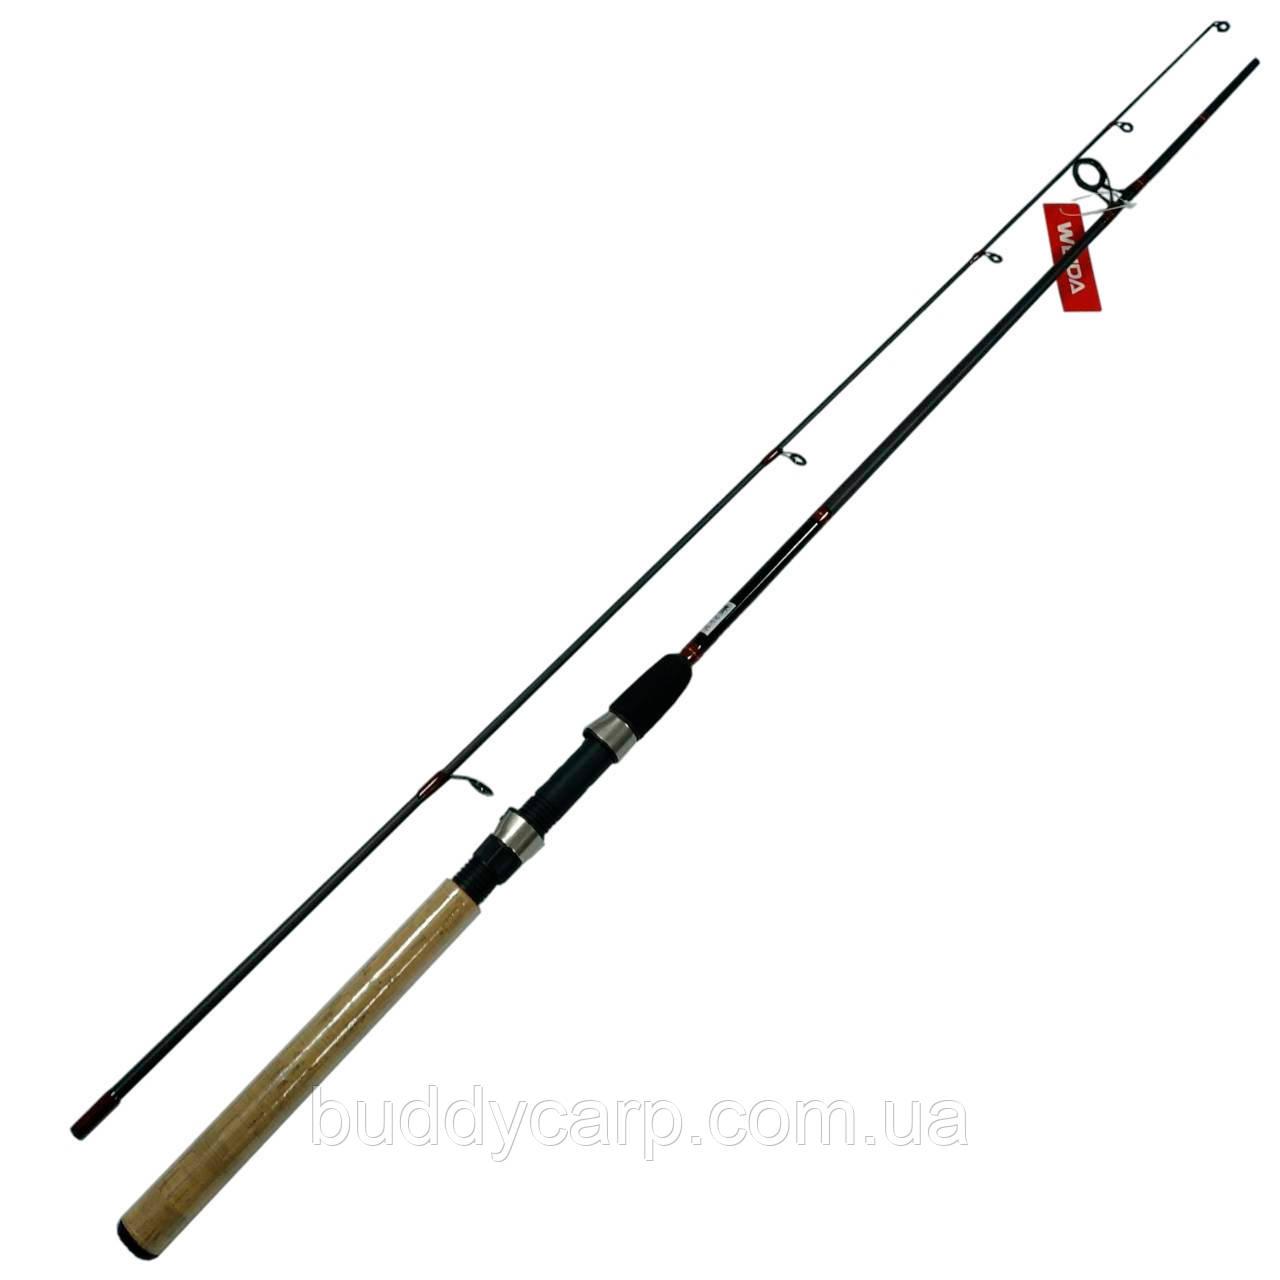 Спінінг 2.4 метра тест 5-20 гр Goddess Weida (Kaida)